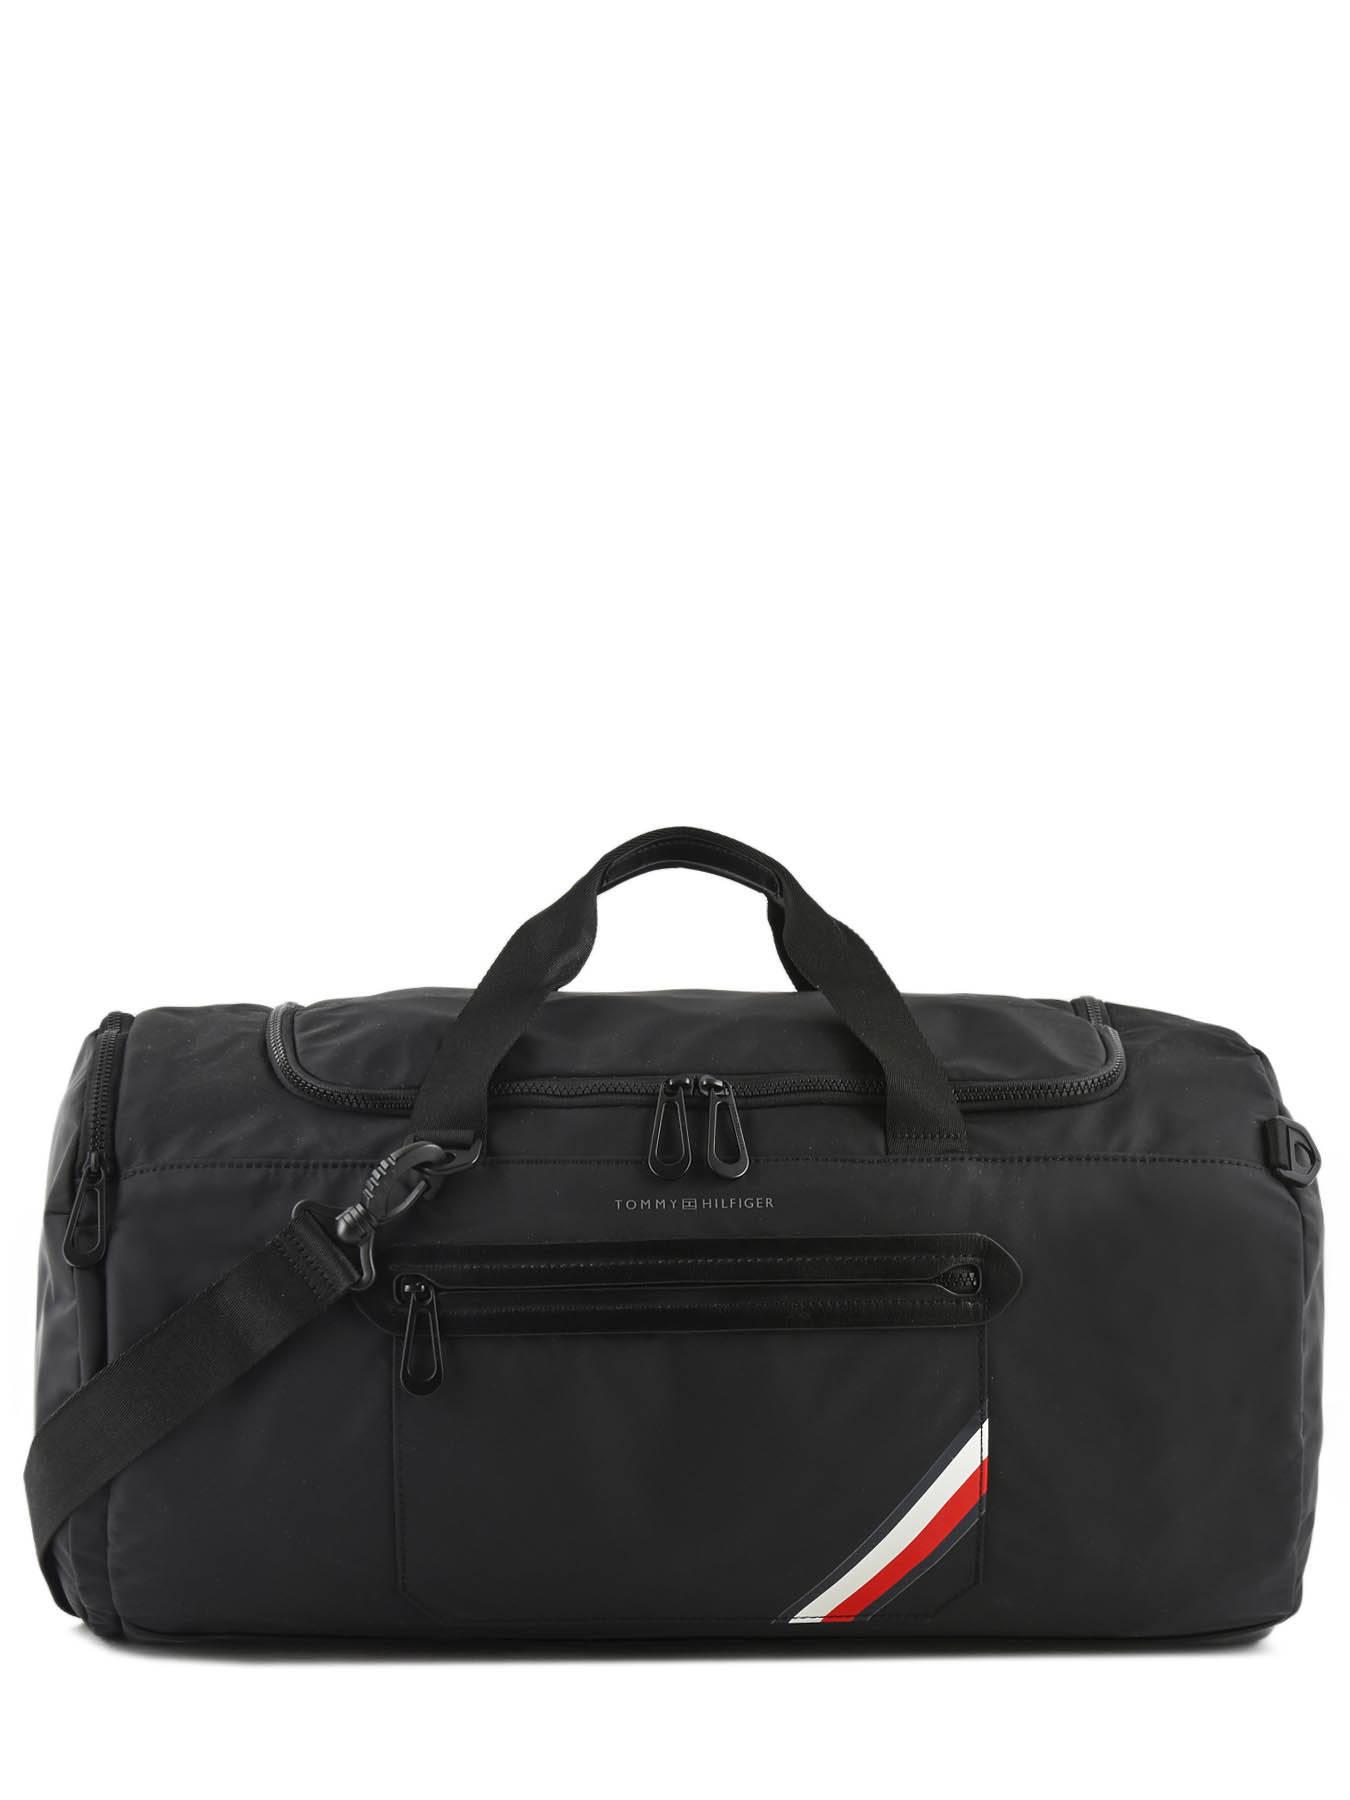 sac voyage tommy hilfiger